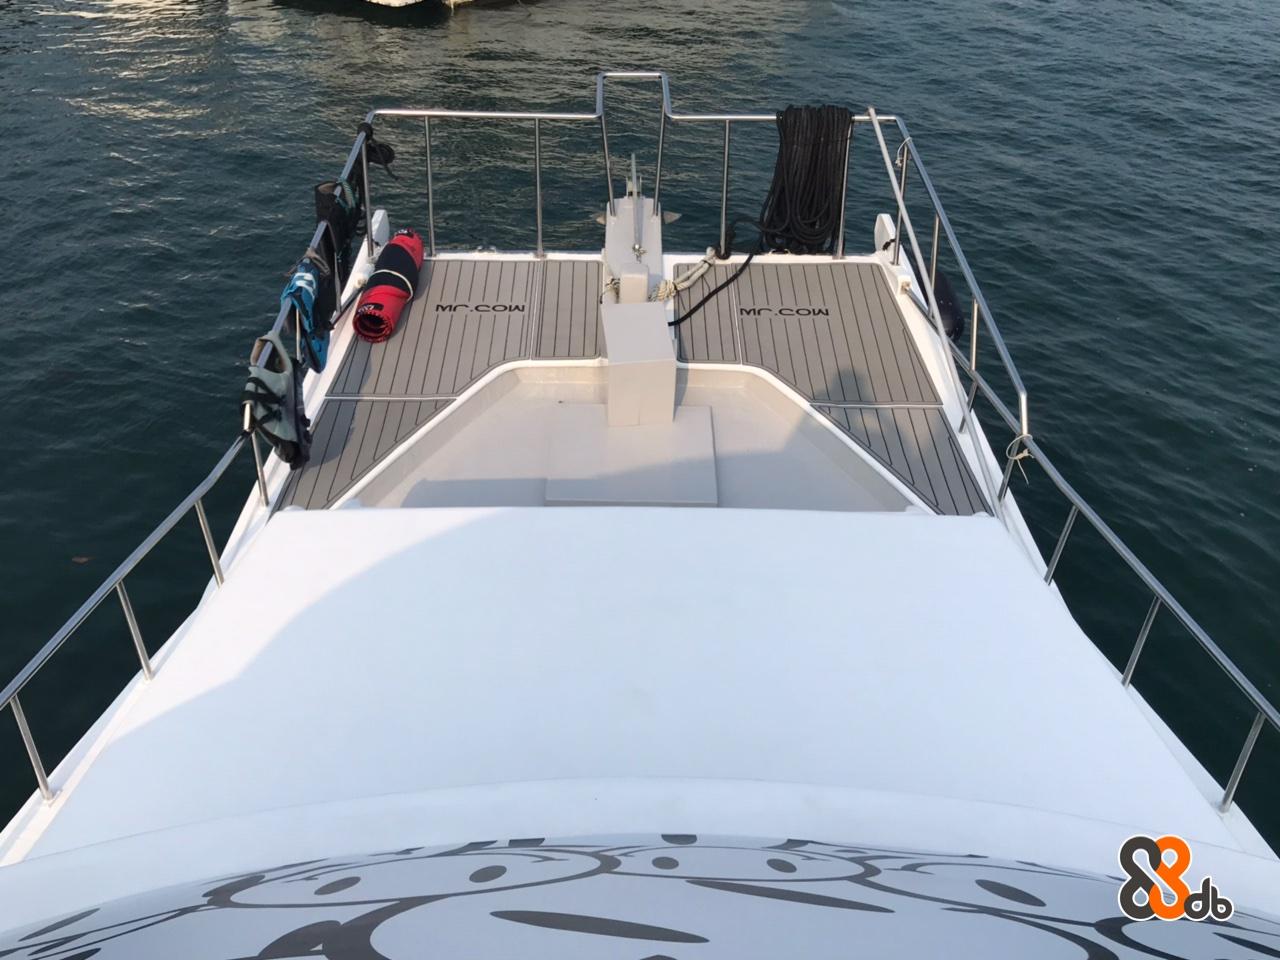 Water transportation,Boat,Vehicle,Yacht,Speedboat